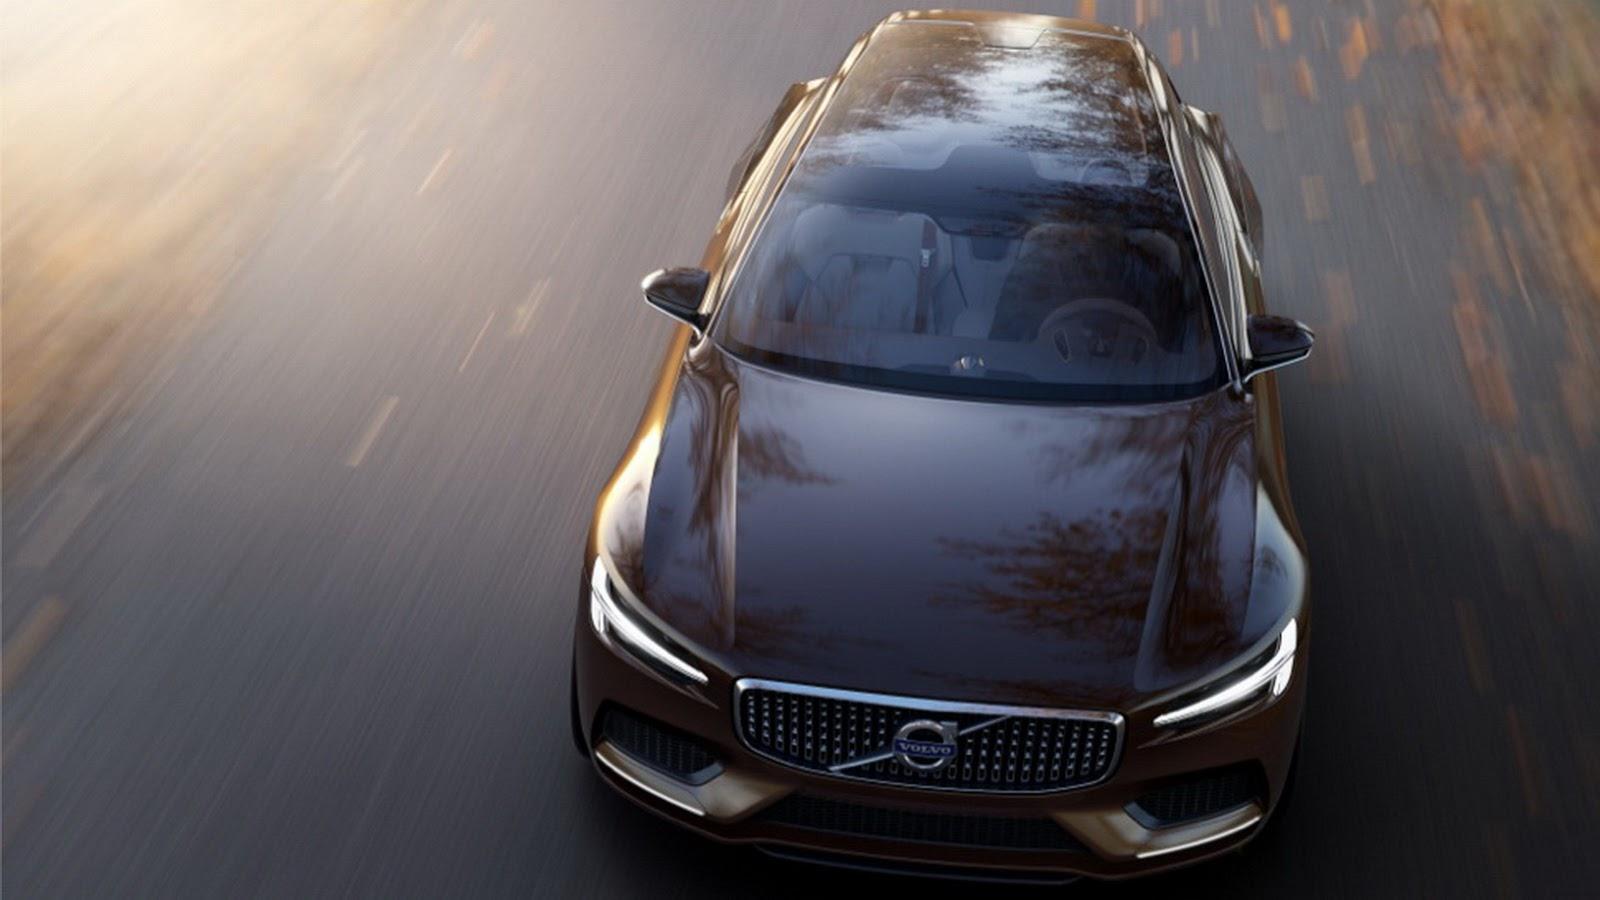 Рассекречен новый концепт-кар Volvo